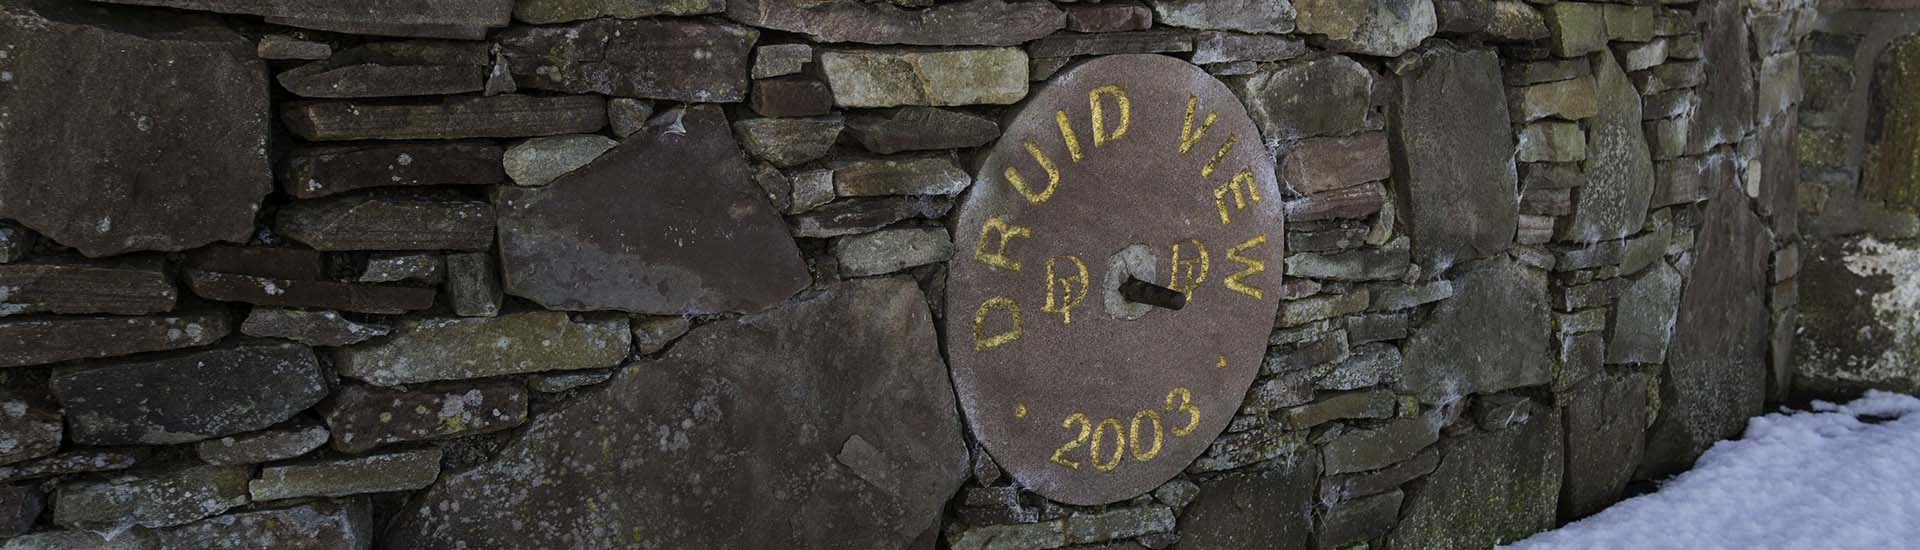 Druid View flagstone